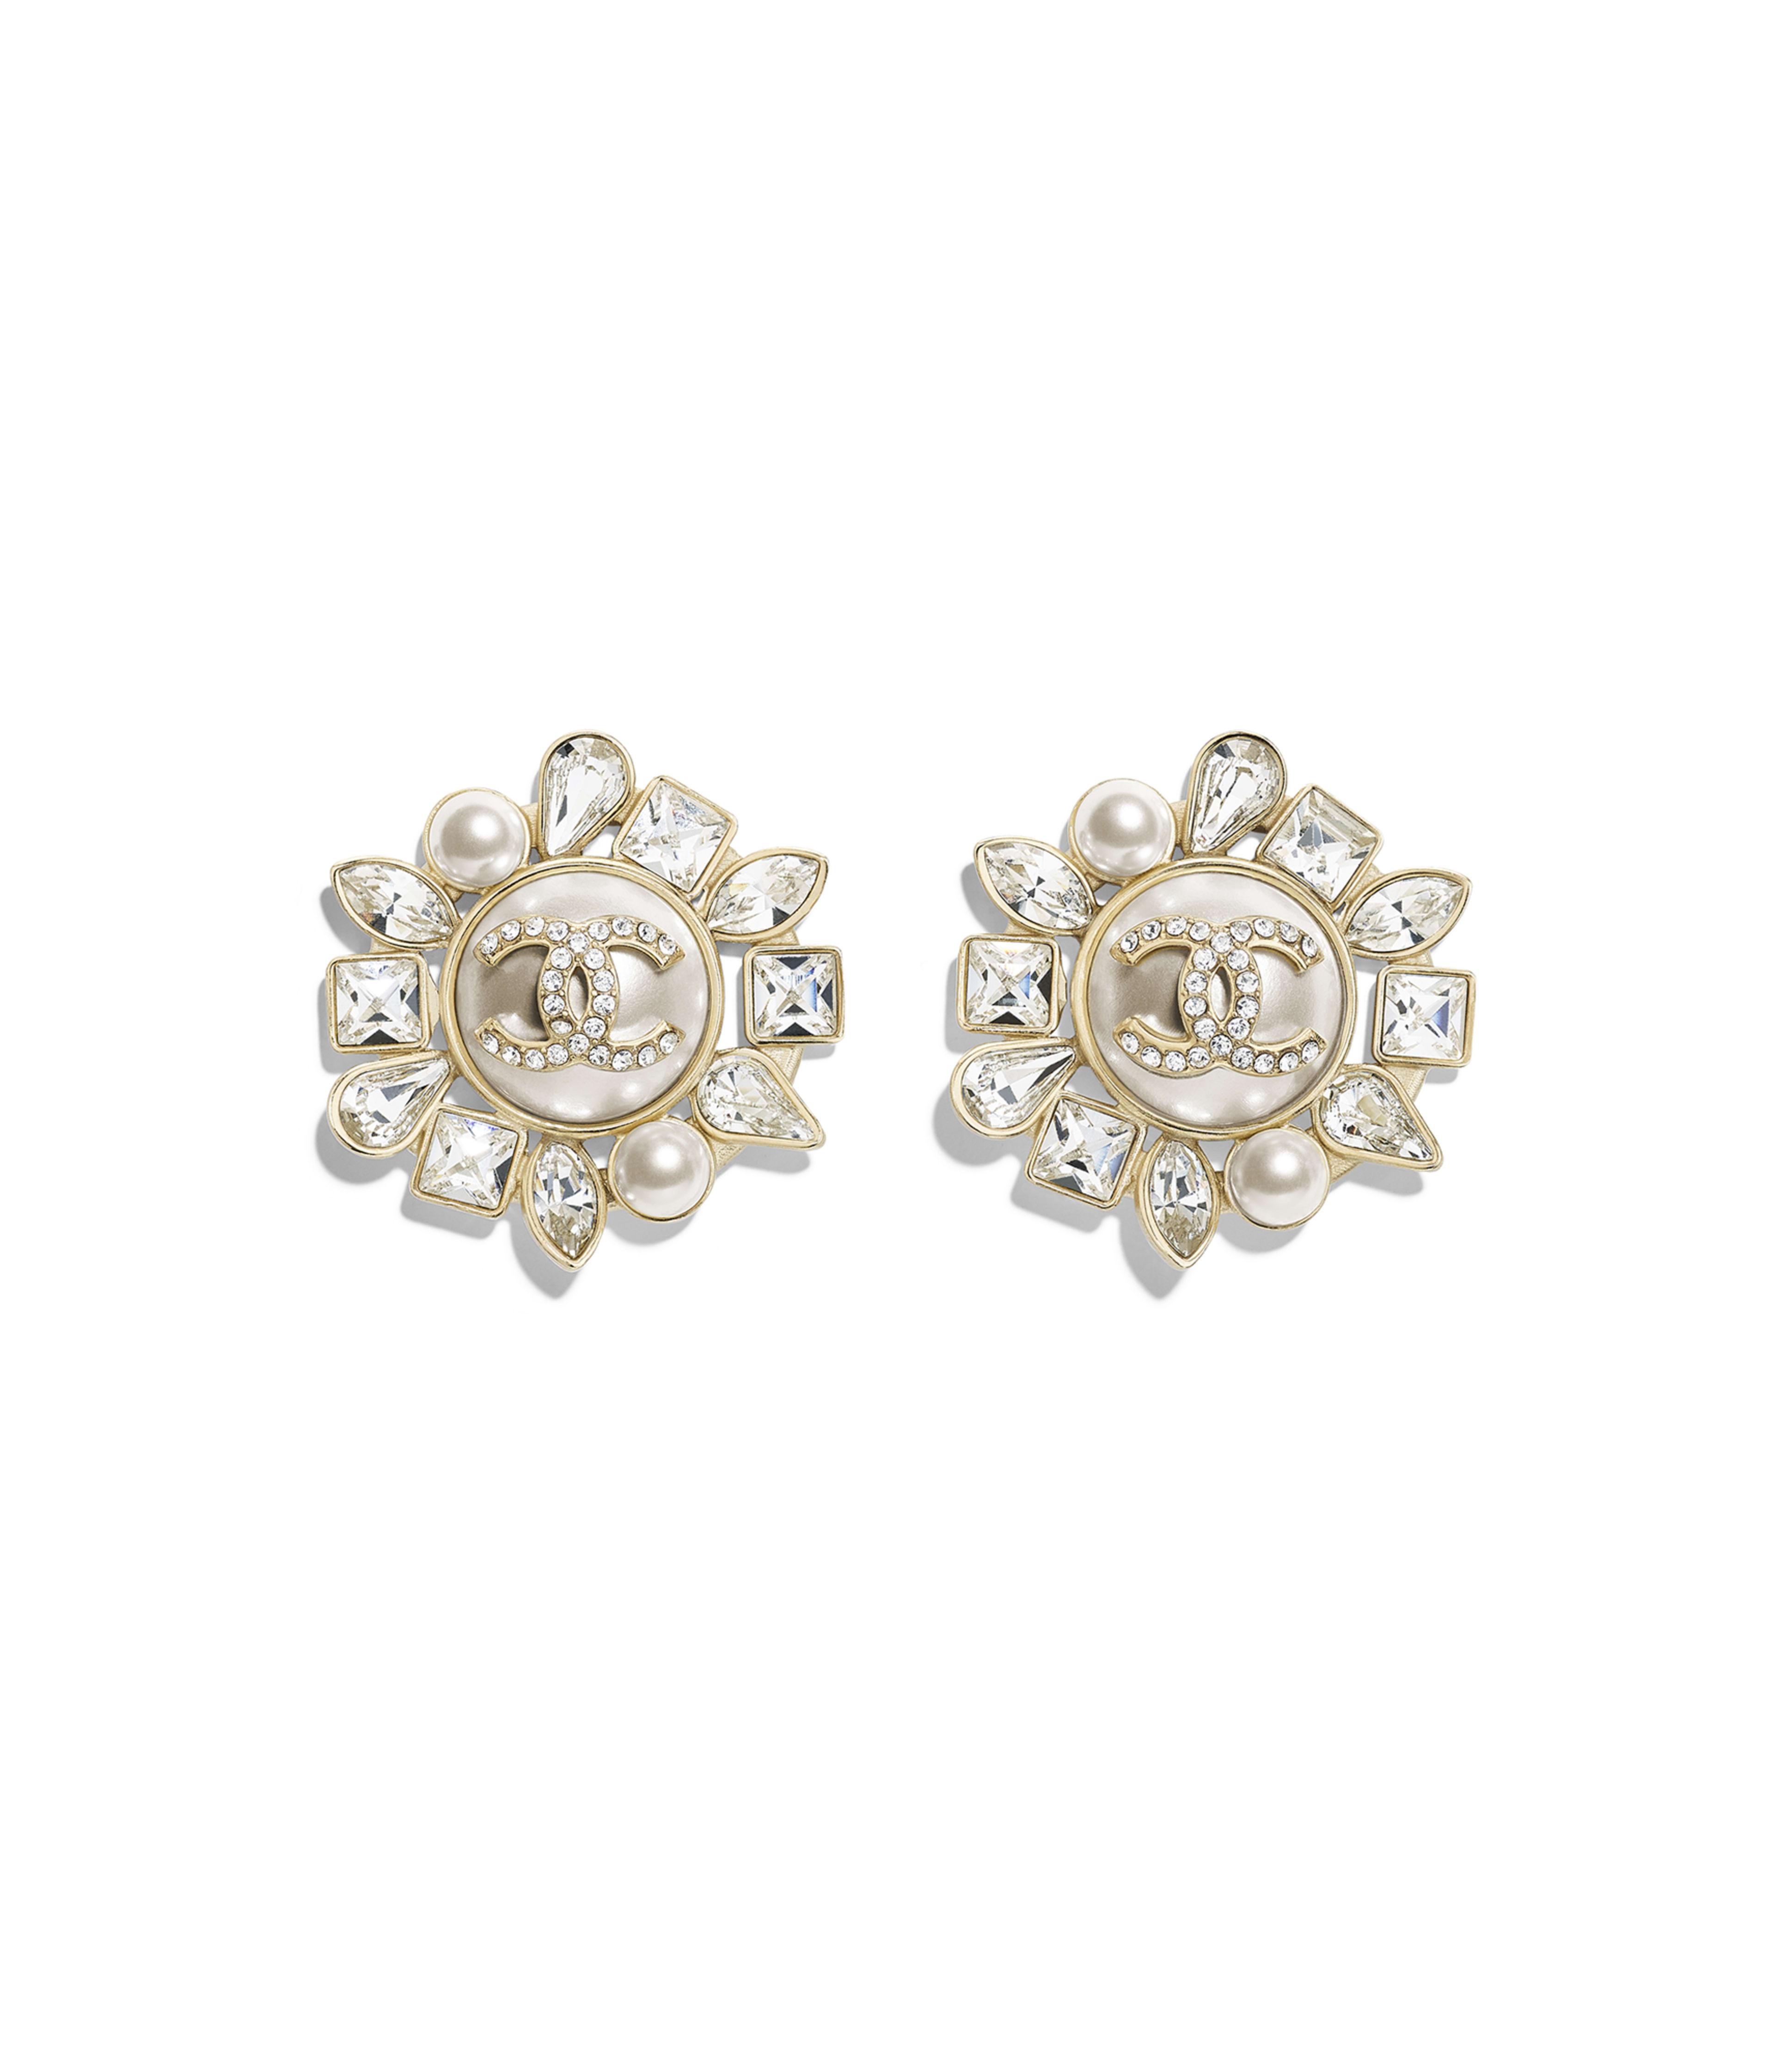 Earrings Costume Jewellery Chanel